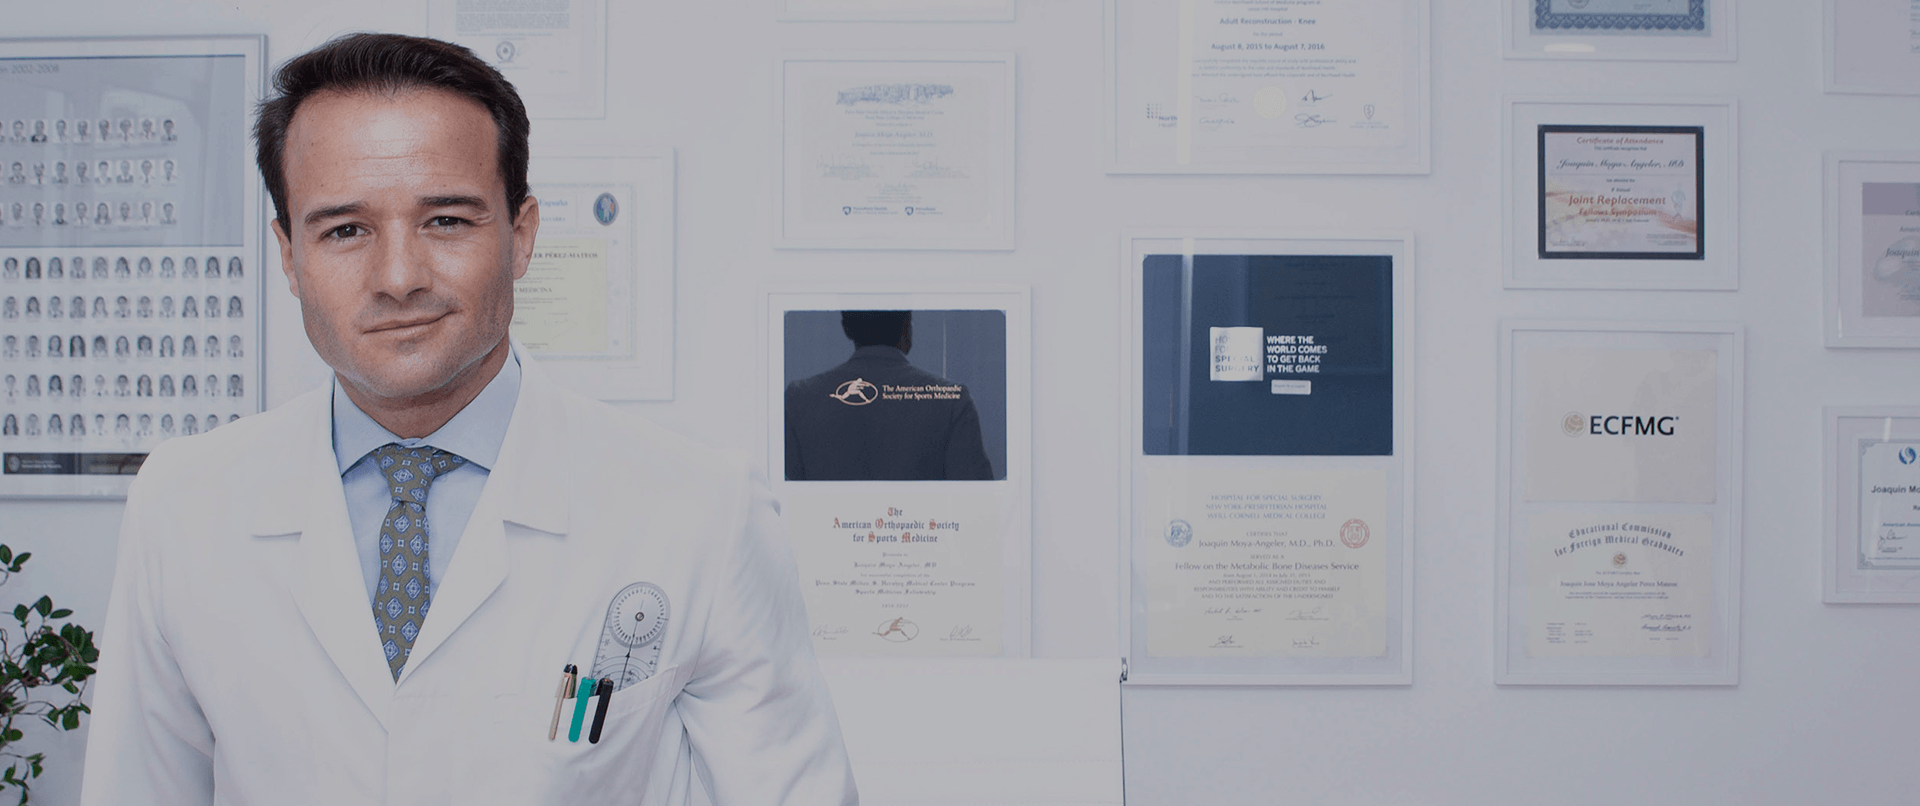 Joaquin Moya Angeler | Orthopedic Surgery and Sports Medicine